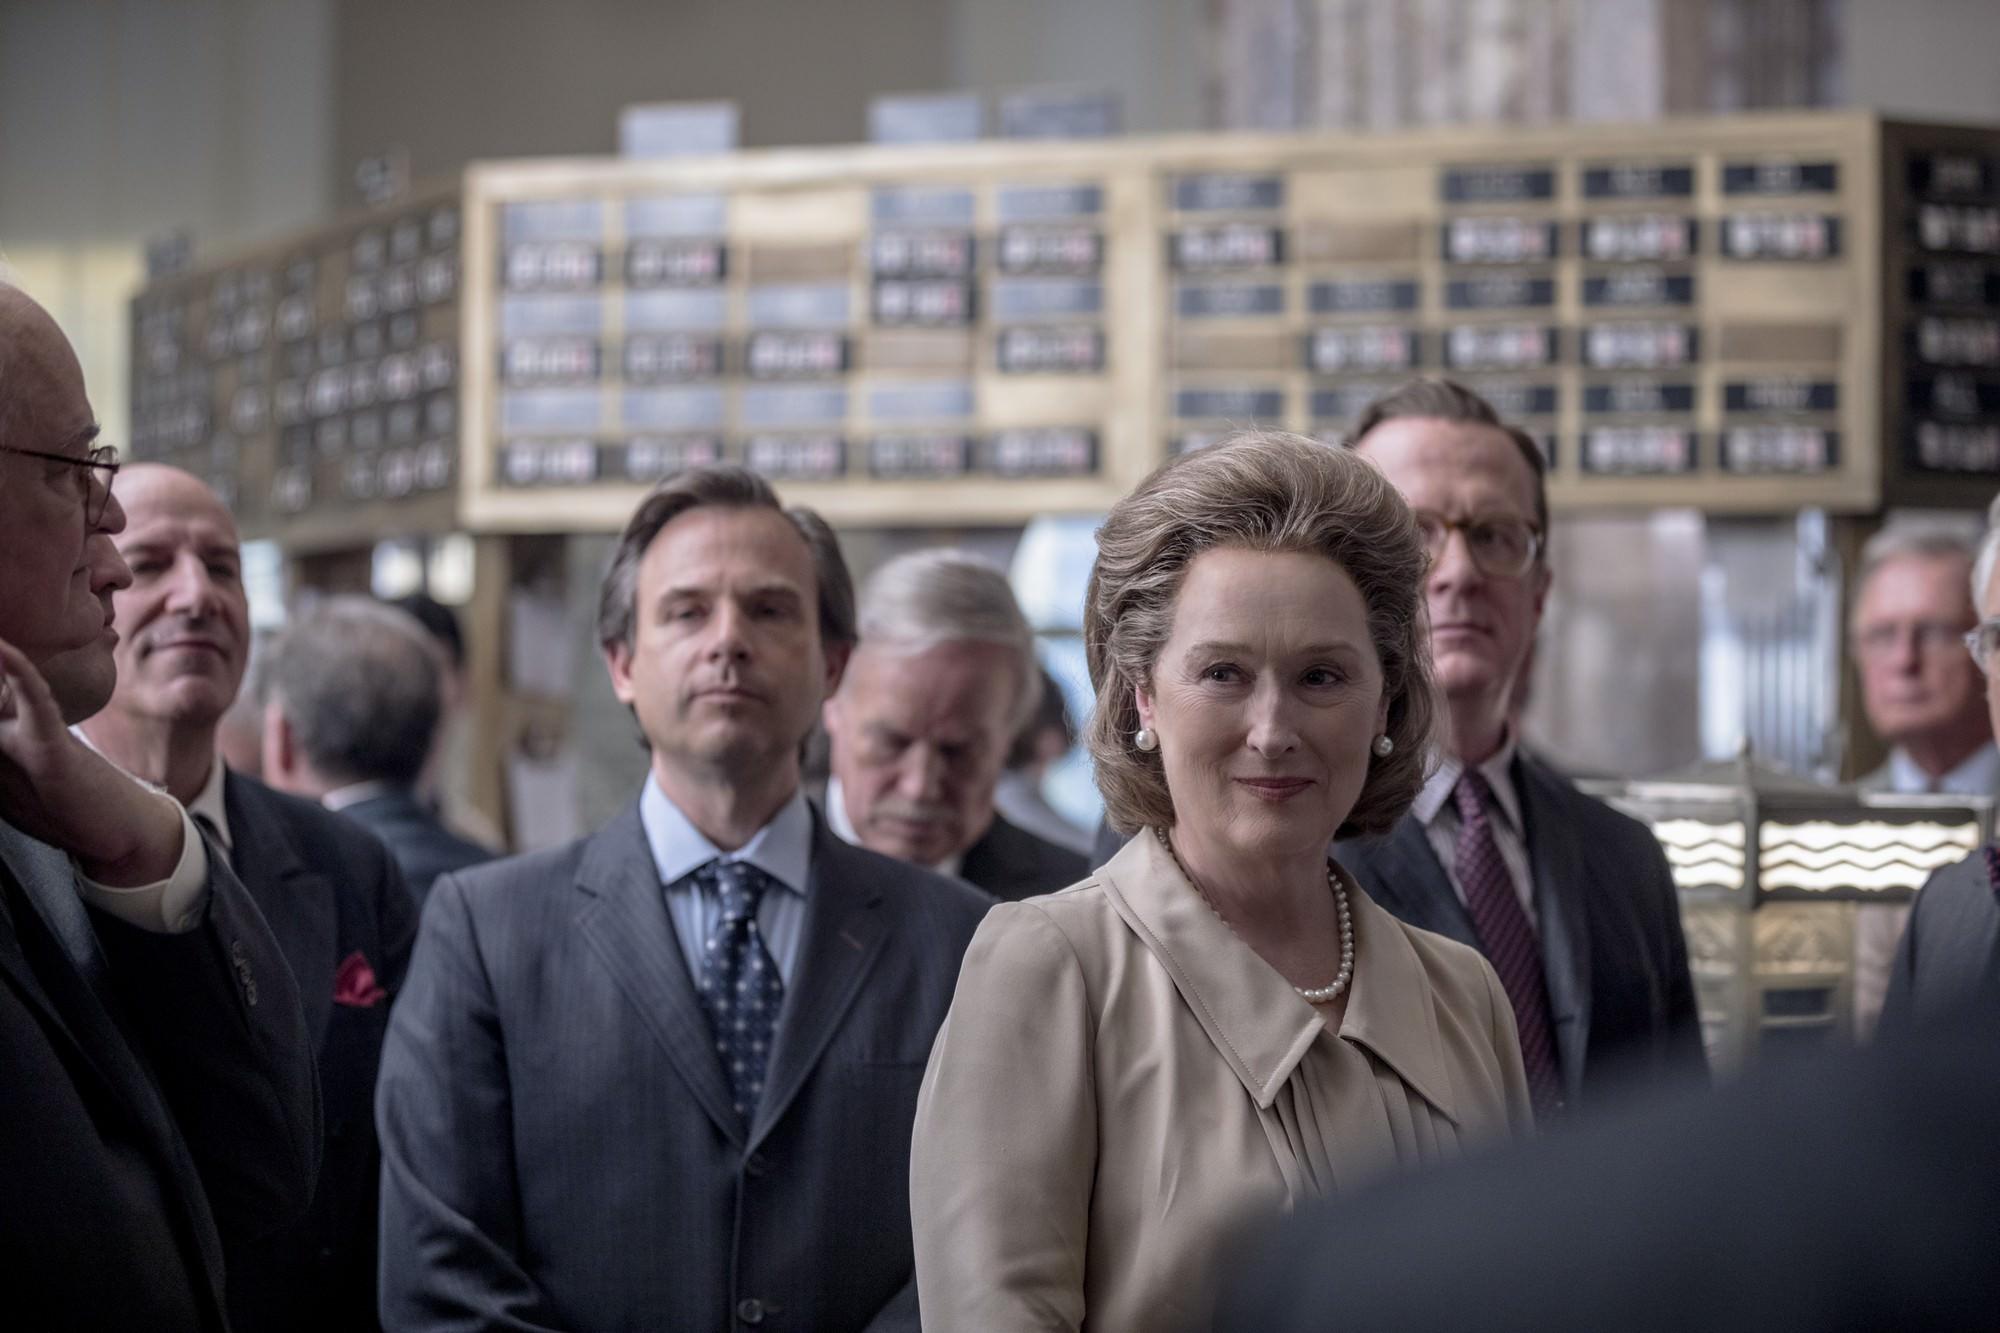 Movie, The Post(美國) / 郵報:密戰(台) / 戰雲密報(港) / 华盛顿邮报(網), 電影劇照